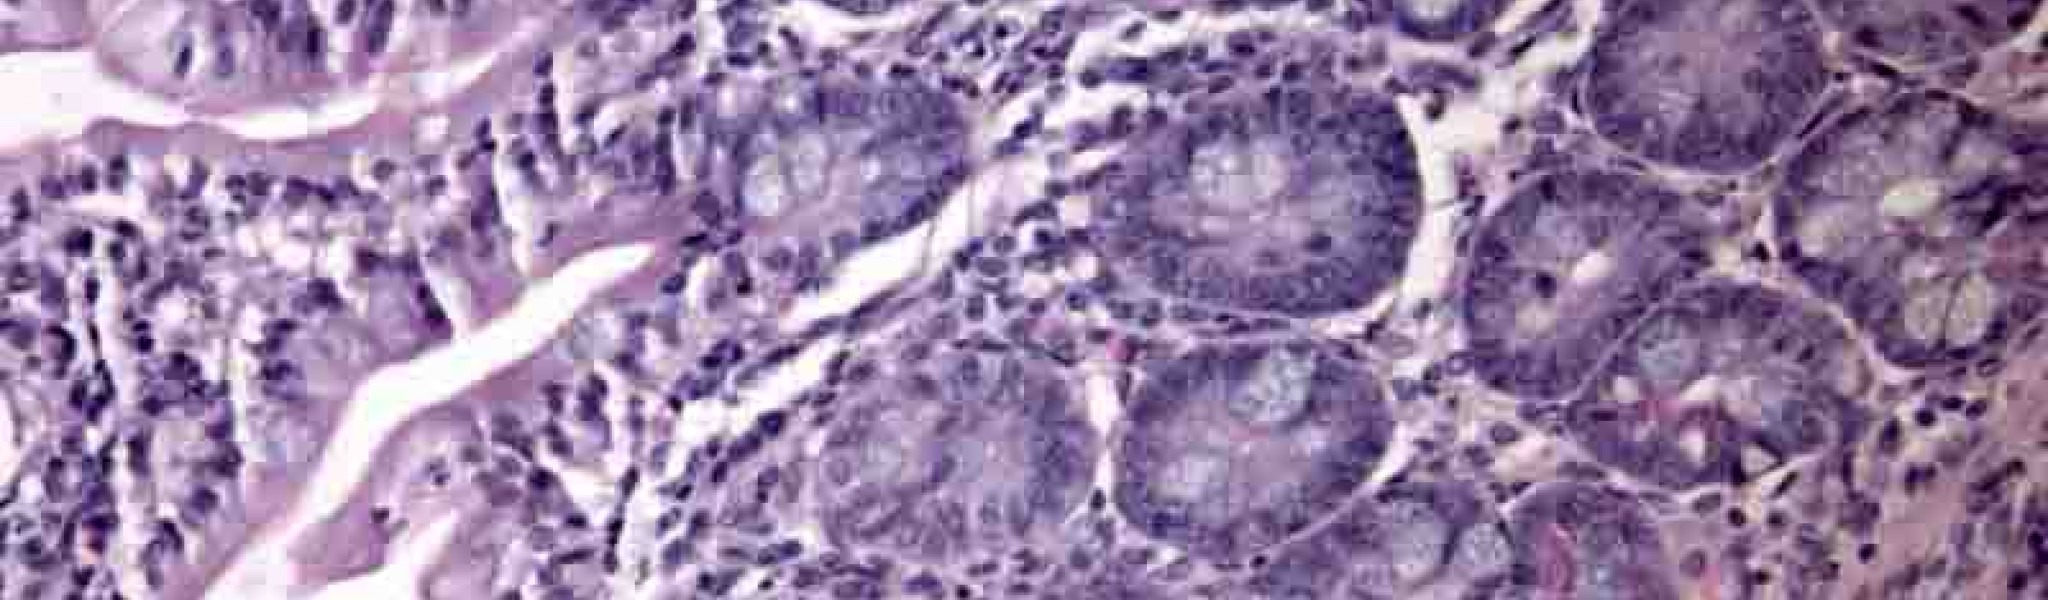 Microscopy Image